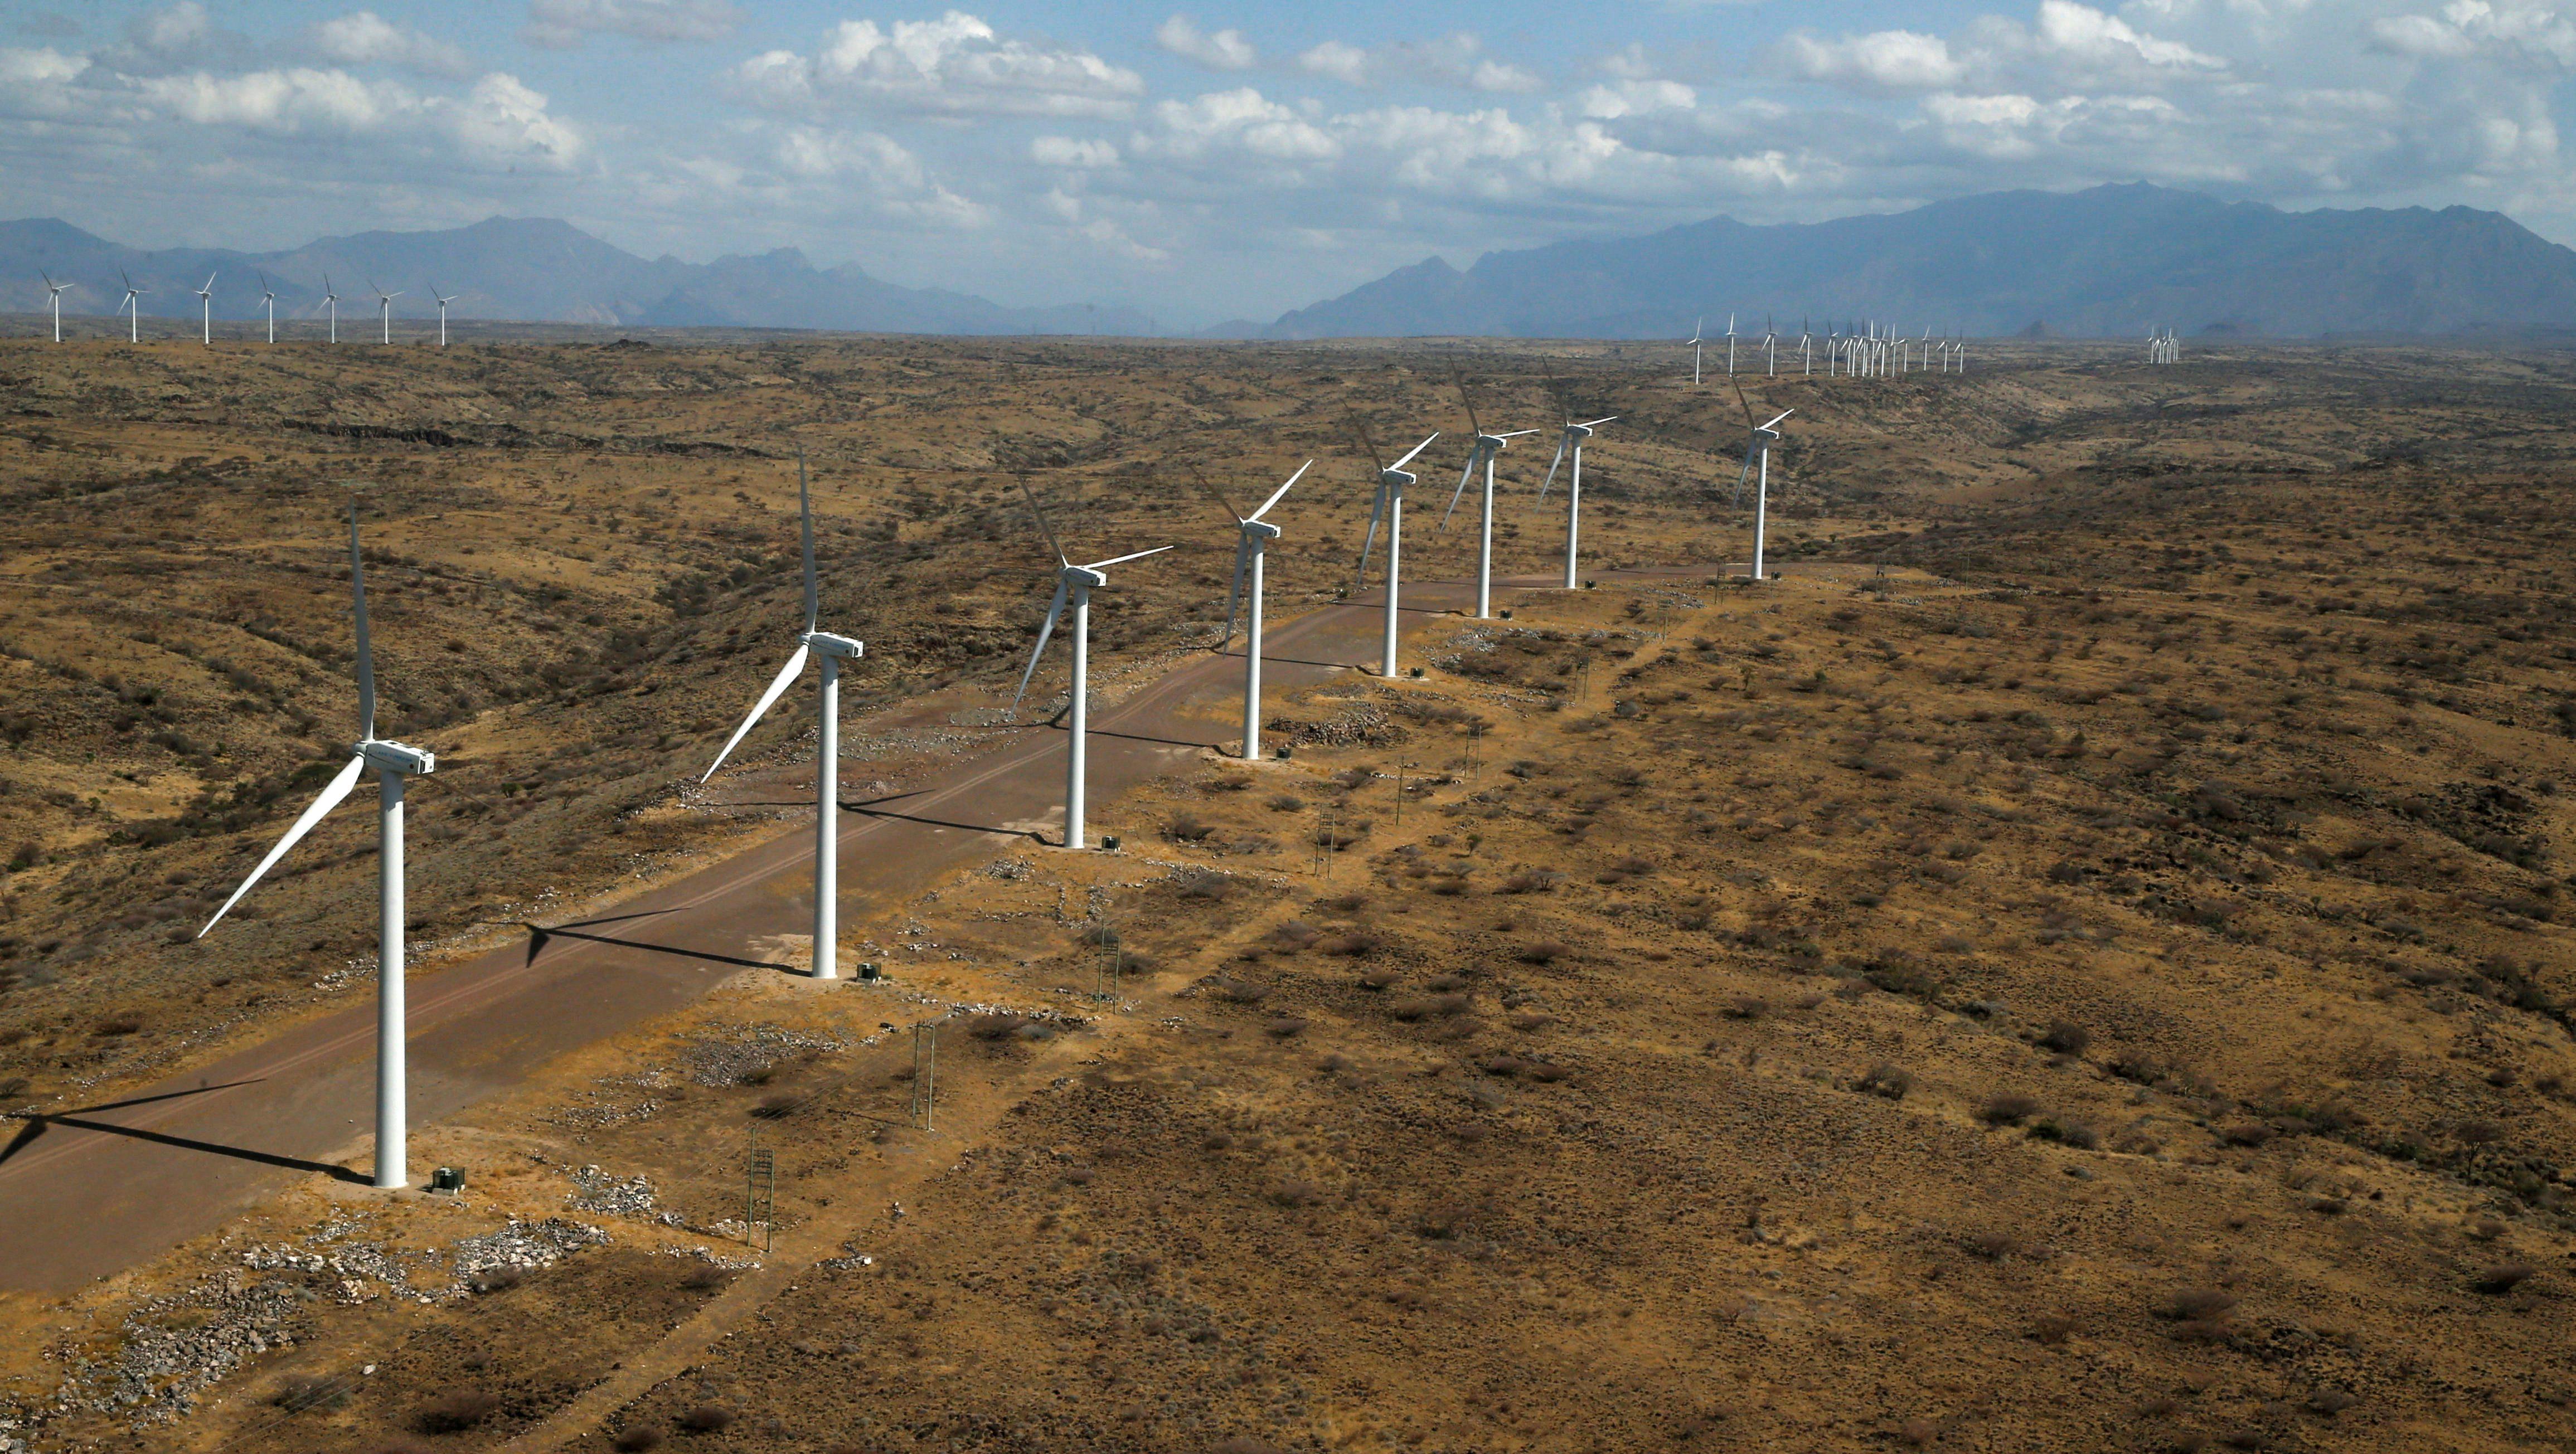 Kenya opens Africa's largest wind power project in Turkana